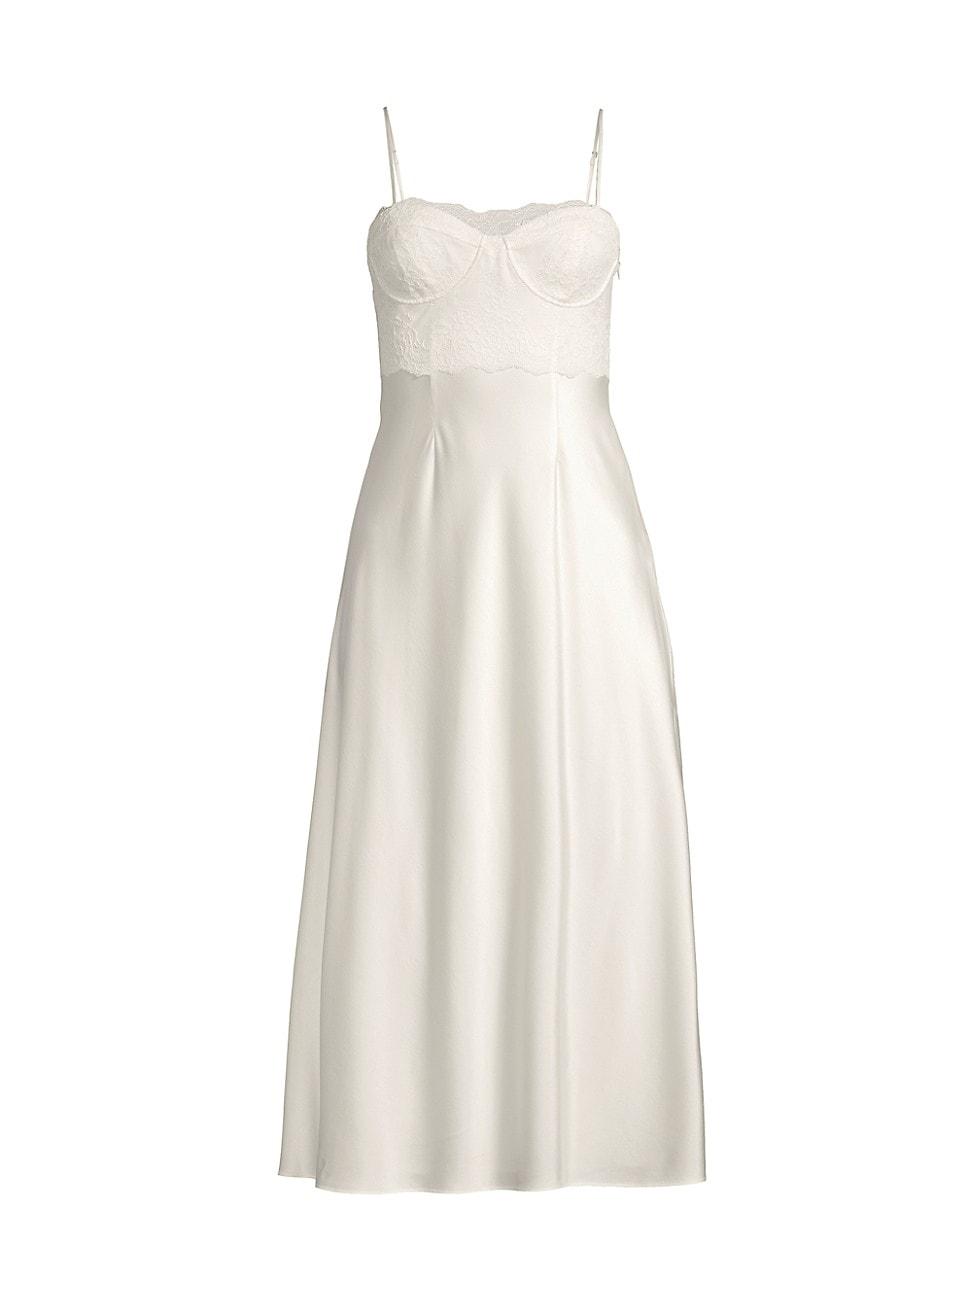 Cami Nyc WOMEN'S BALEY LACE & SILK DRESS